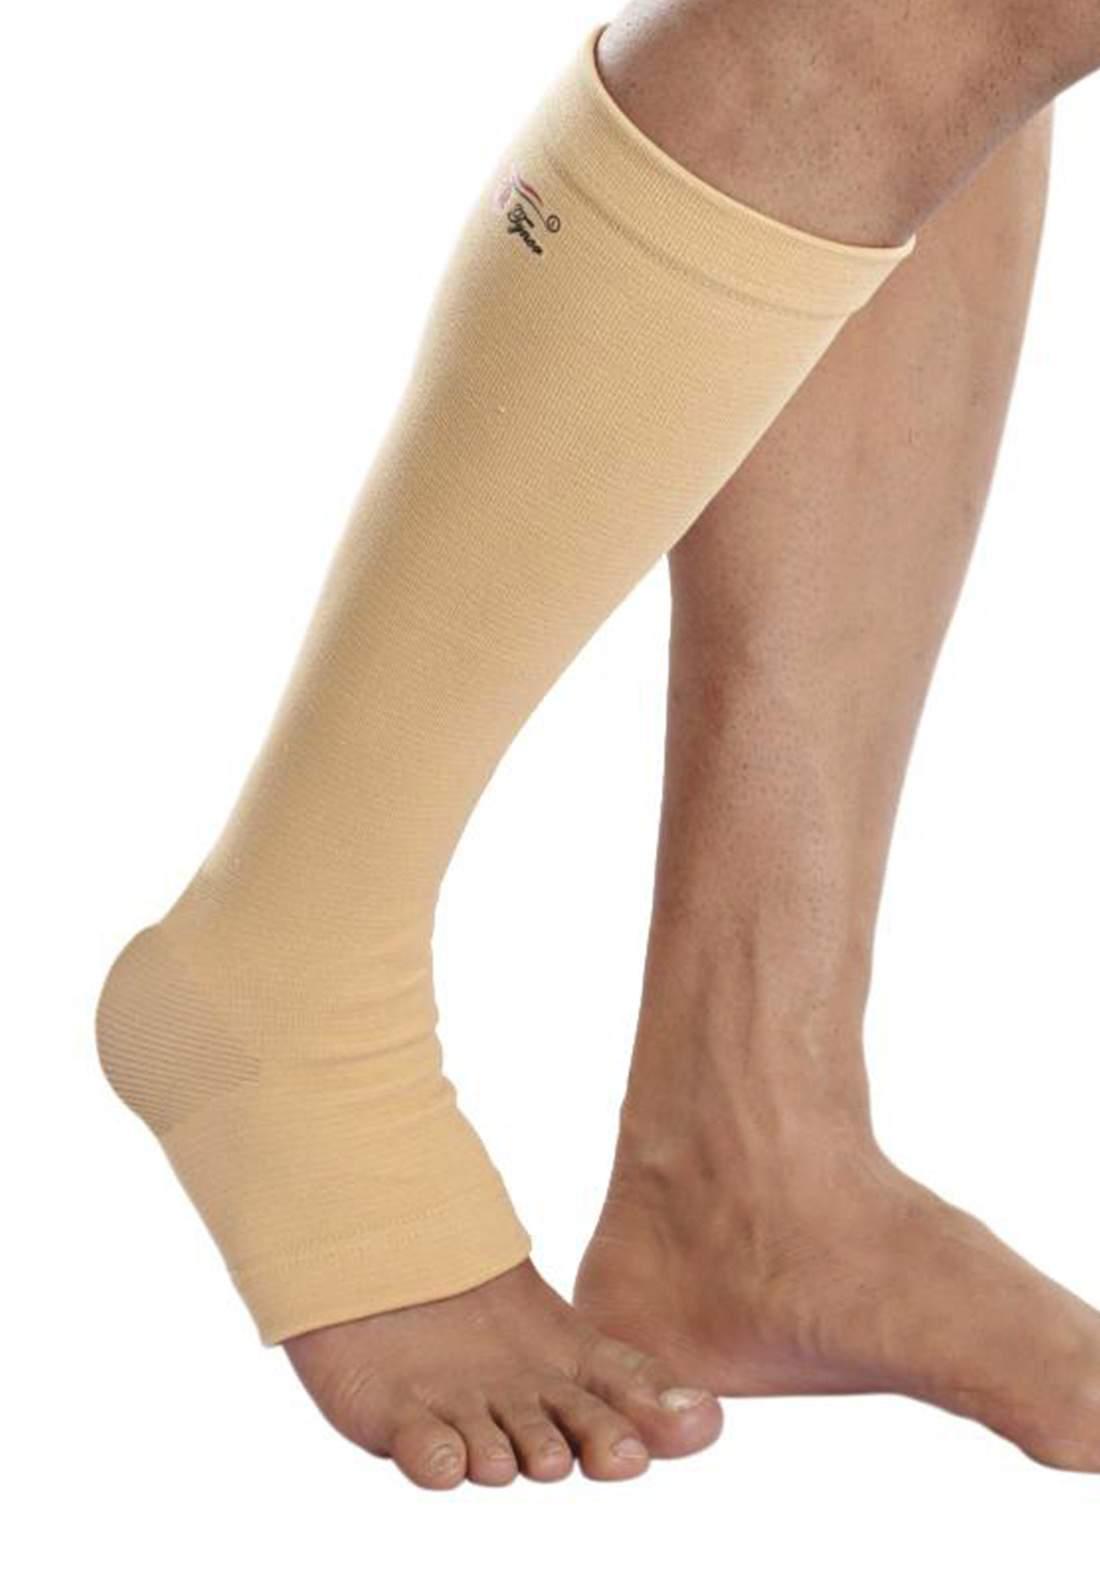 Tynor I-16 Compression Stockings جوارب دوالي تحت الركبة